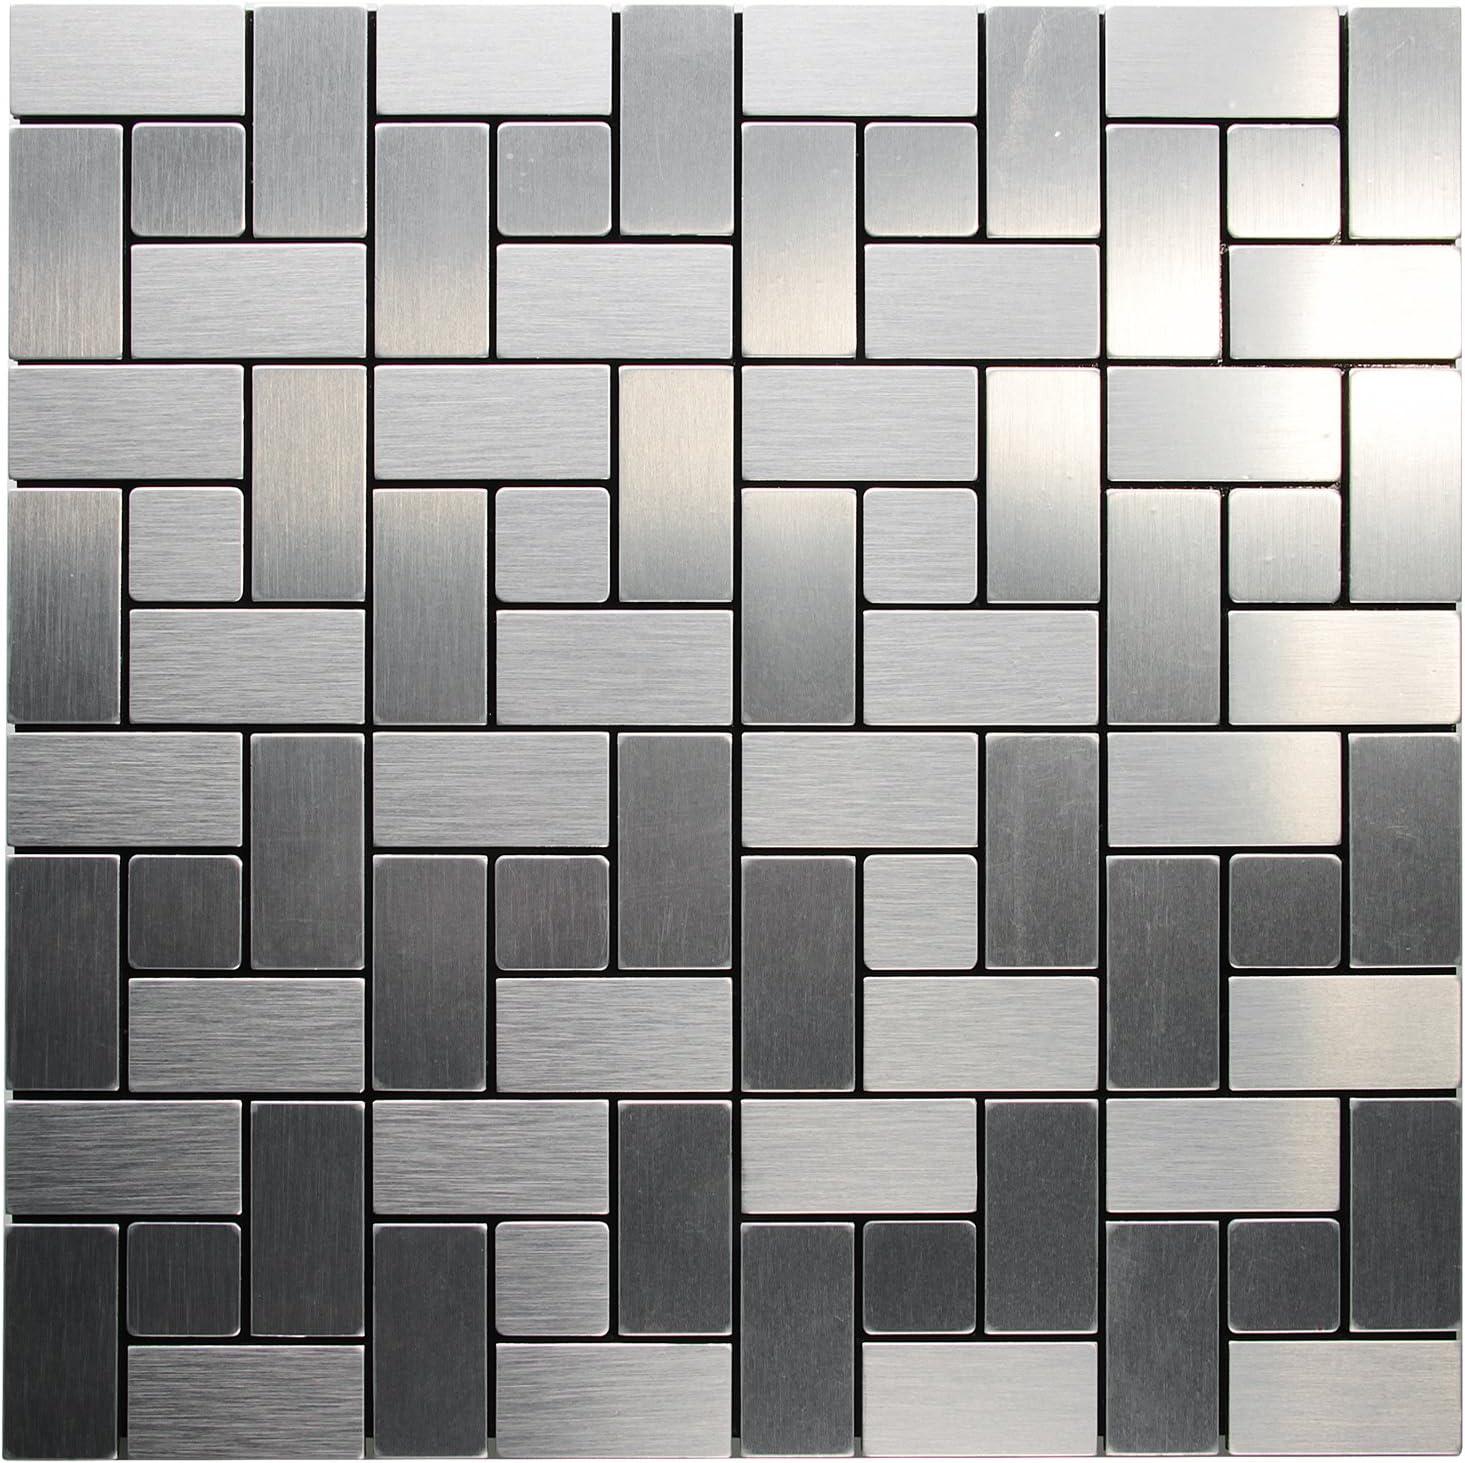 - Amazon.com: Royllent, Aluminum Mosaic Tile, Peel & Stick